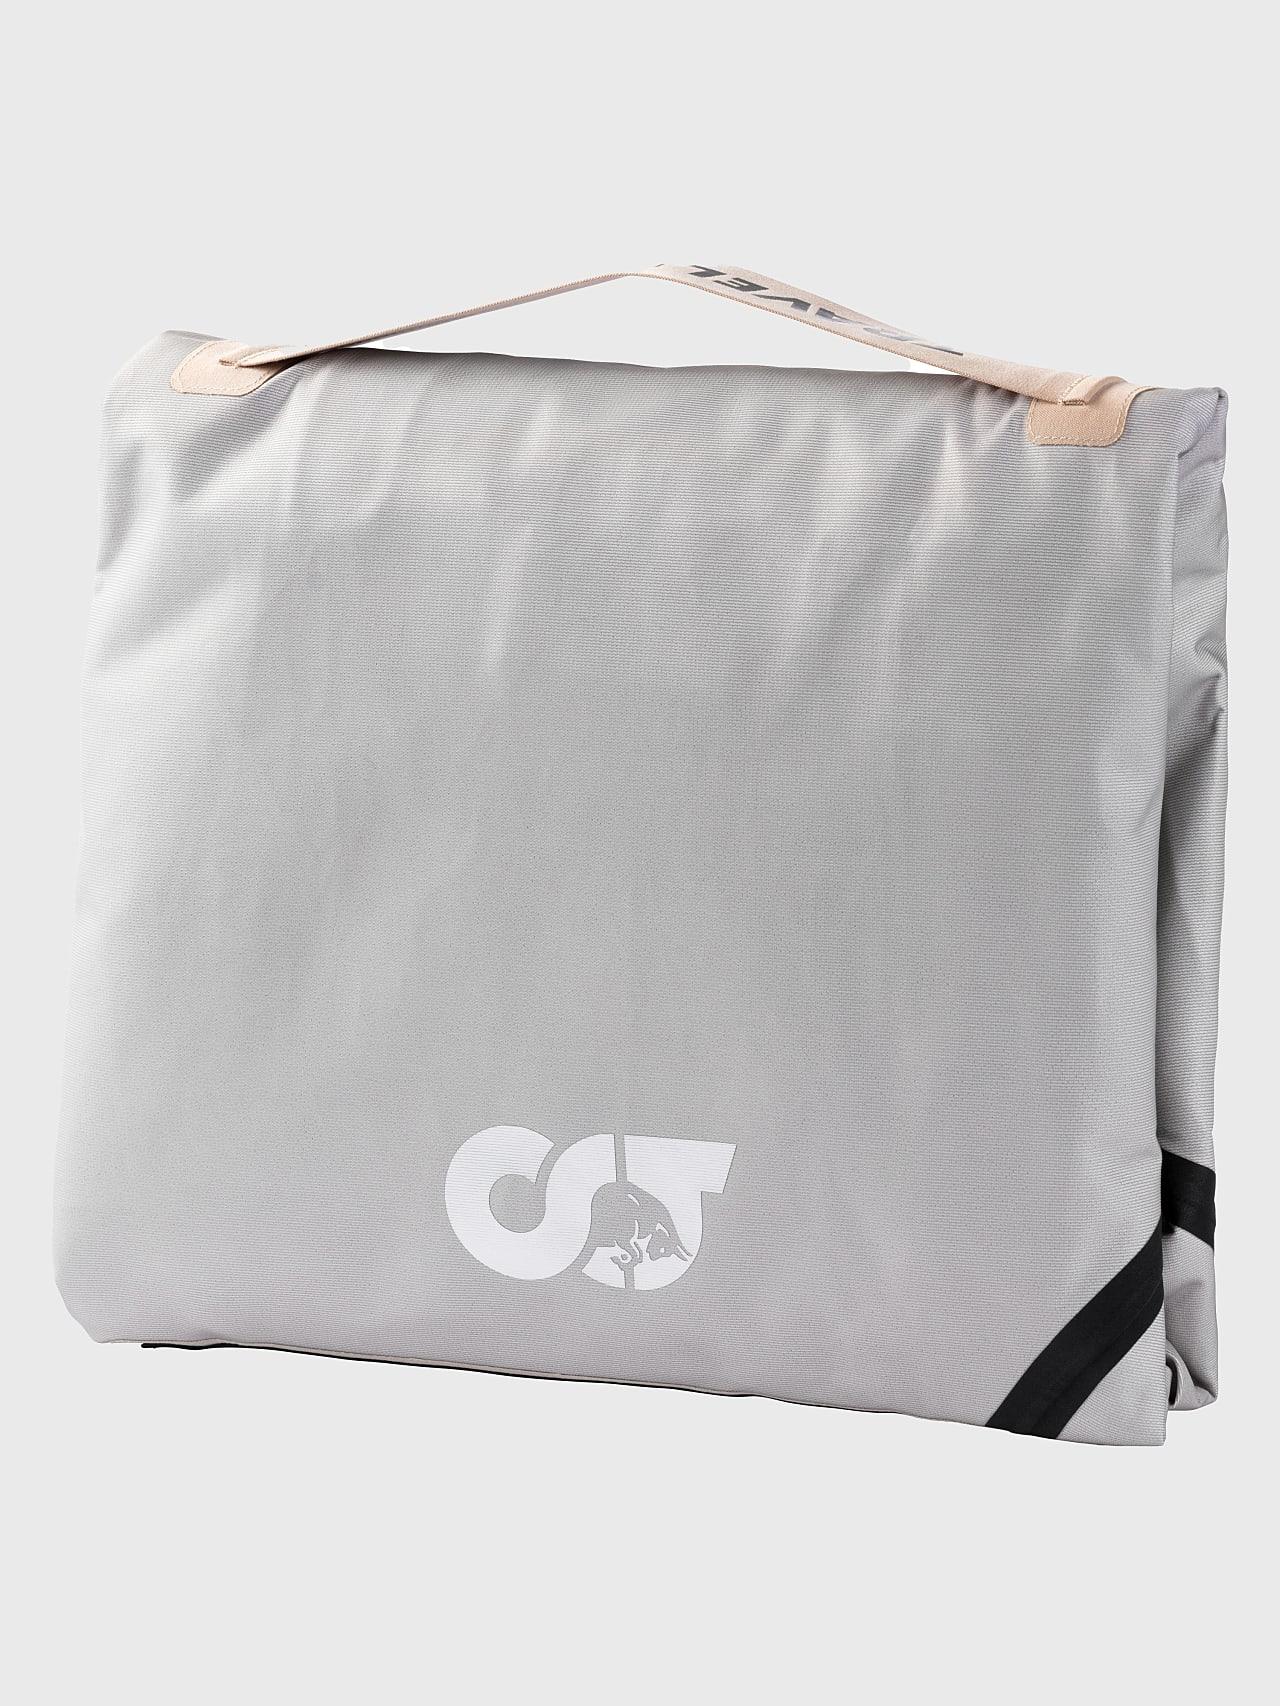 OKOVO V3.Y5.01 Packable Waterproof Jacket Sand scene7.view.9.name Alpha Tauri